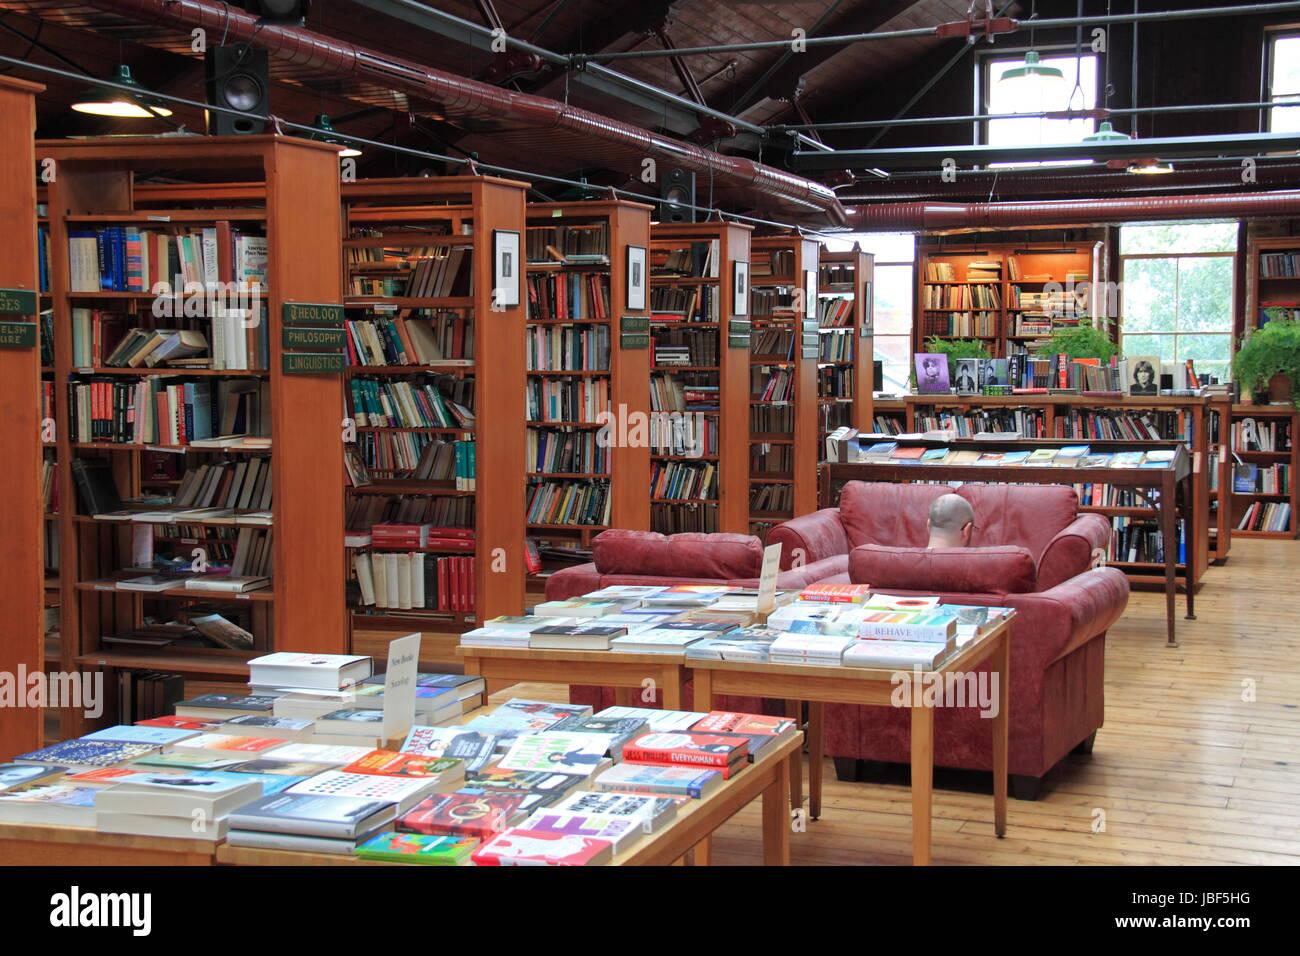 Richard Booth's Bookshop, Lion Street, Hay-on-Wye, Brecknockshire, Powys, Wales, Great Britain, United Kingdom, - Stock Image